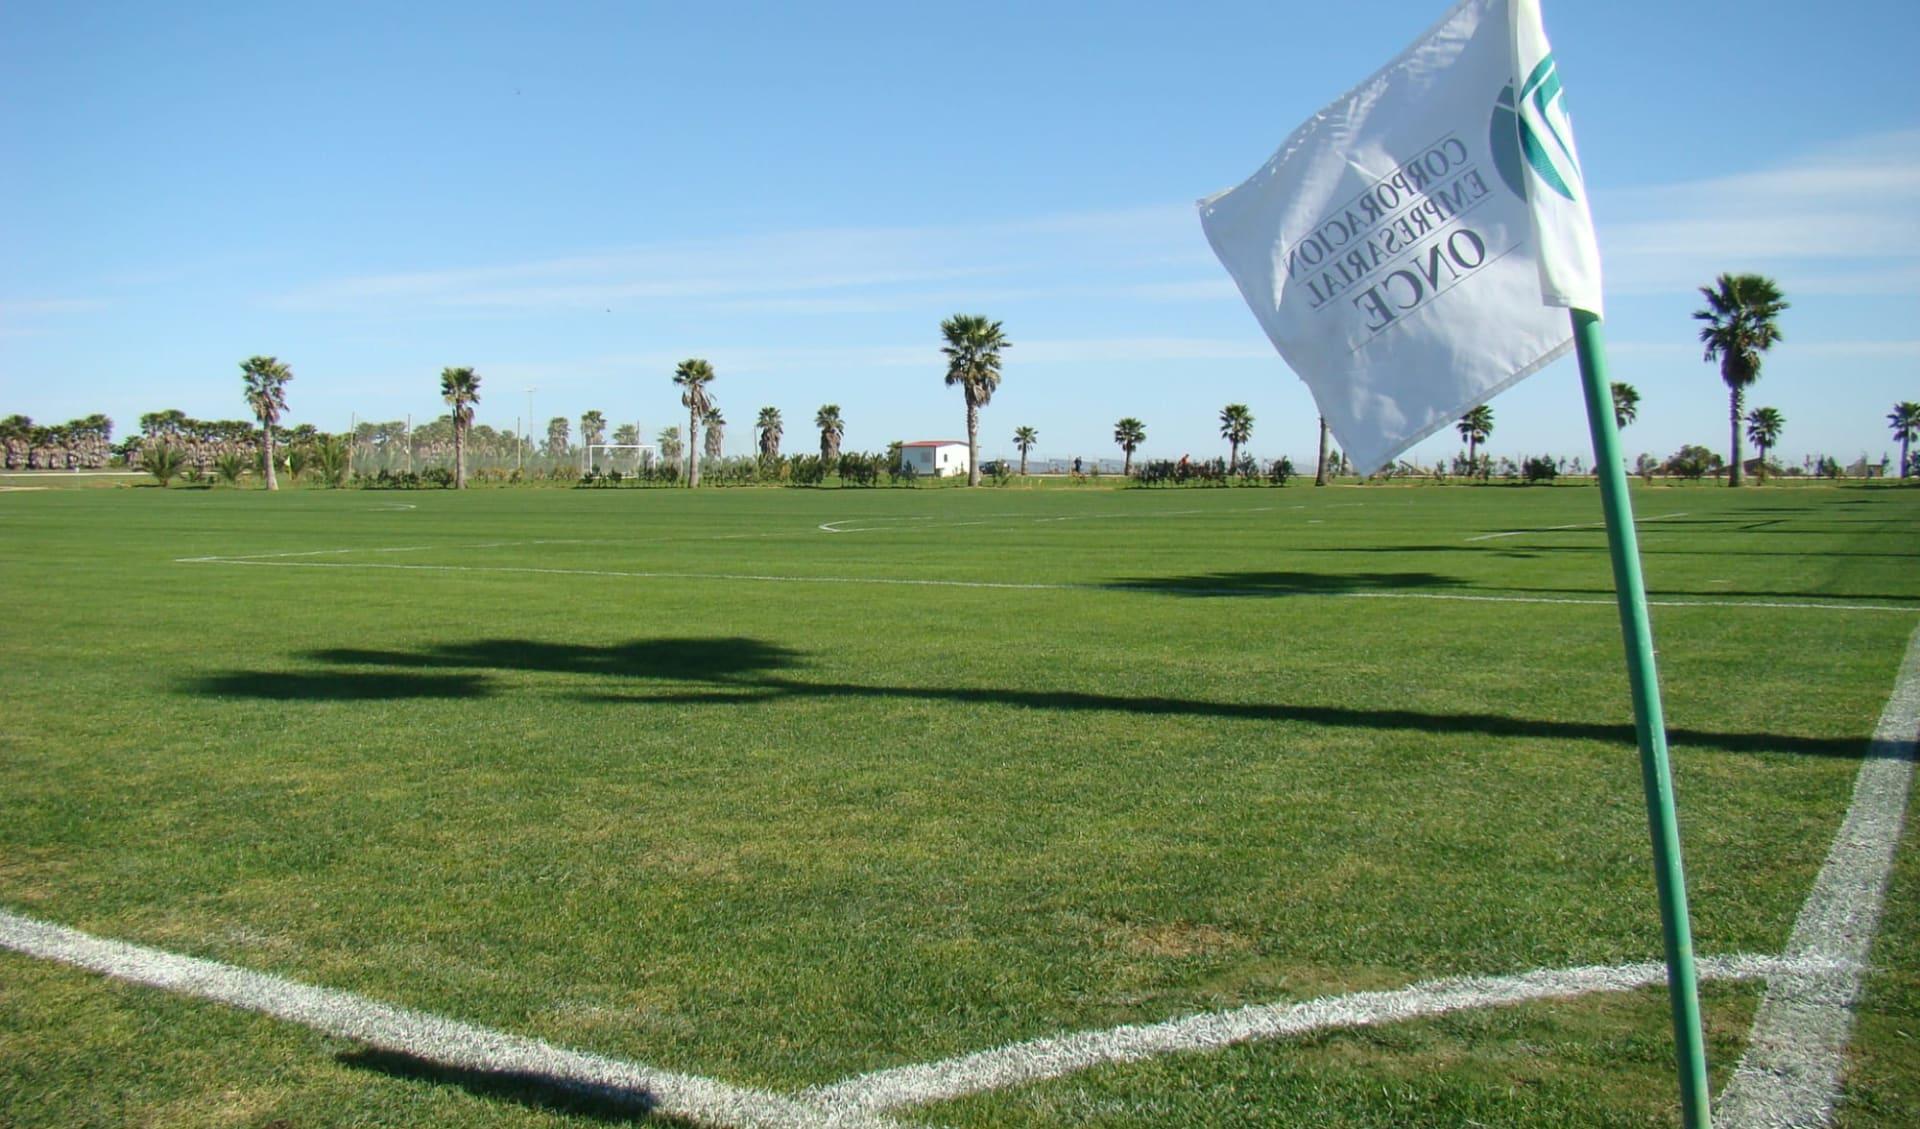 Islantilla - Islantilla Golf Resort ab Malaga: A1_Islantilla campo 2